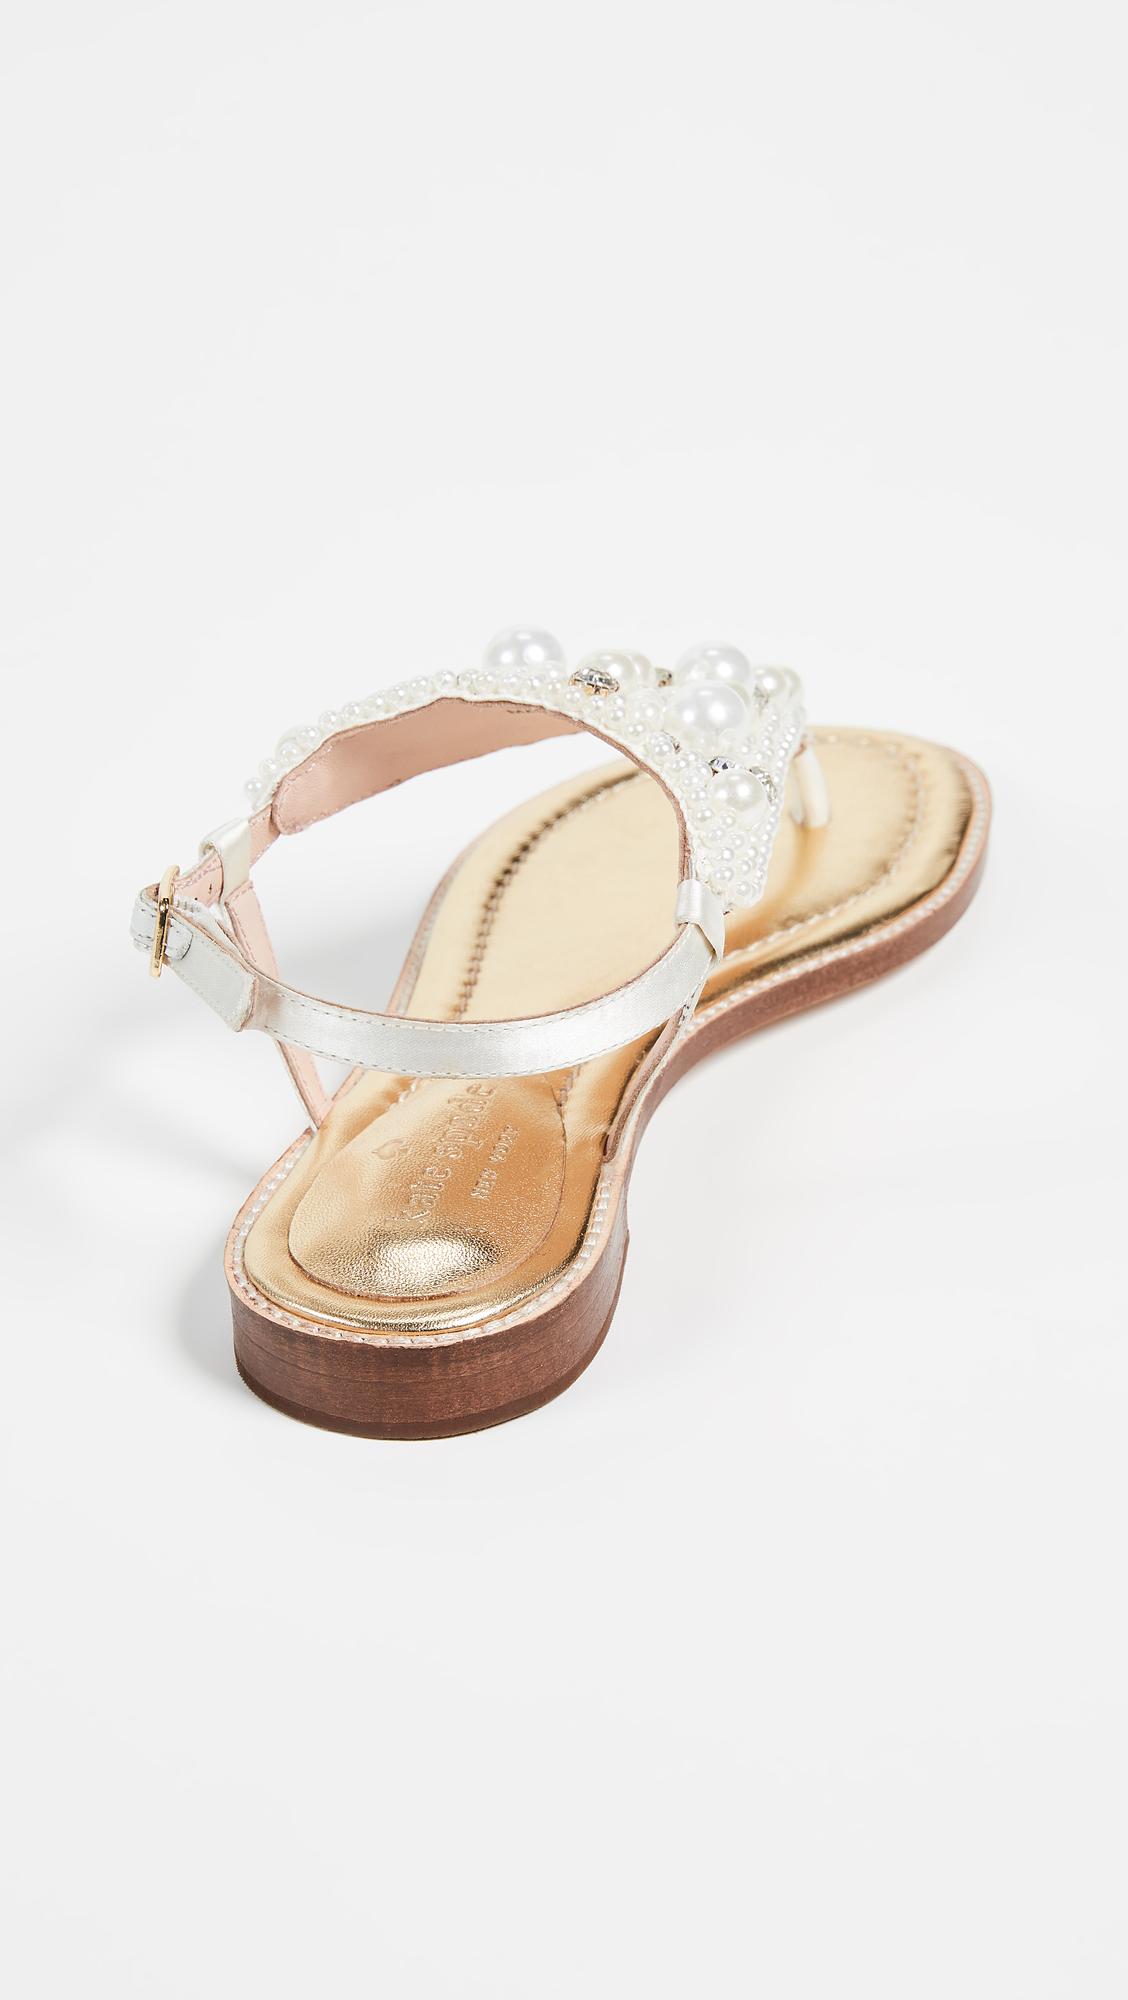 0908c2c4ccf9 Kate Spade New York Sama Imitation Pearl Sandals